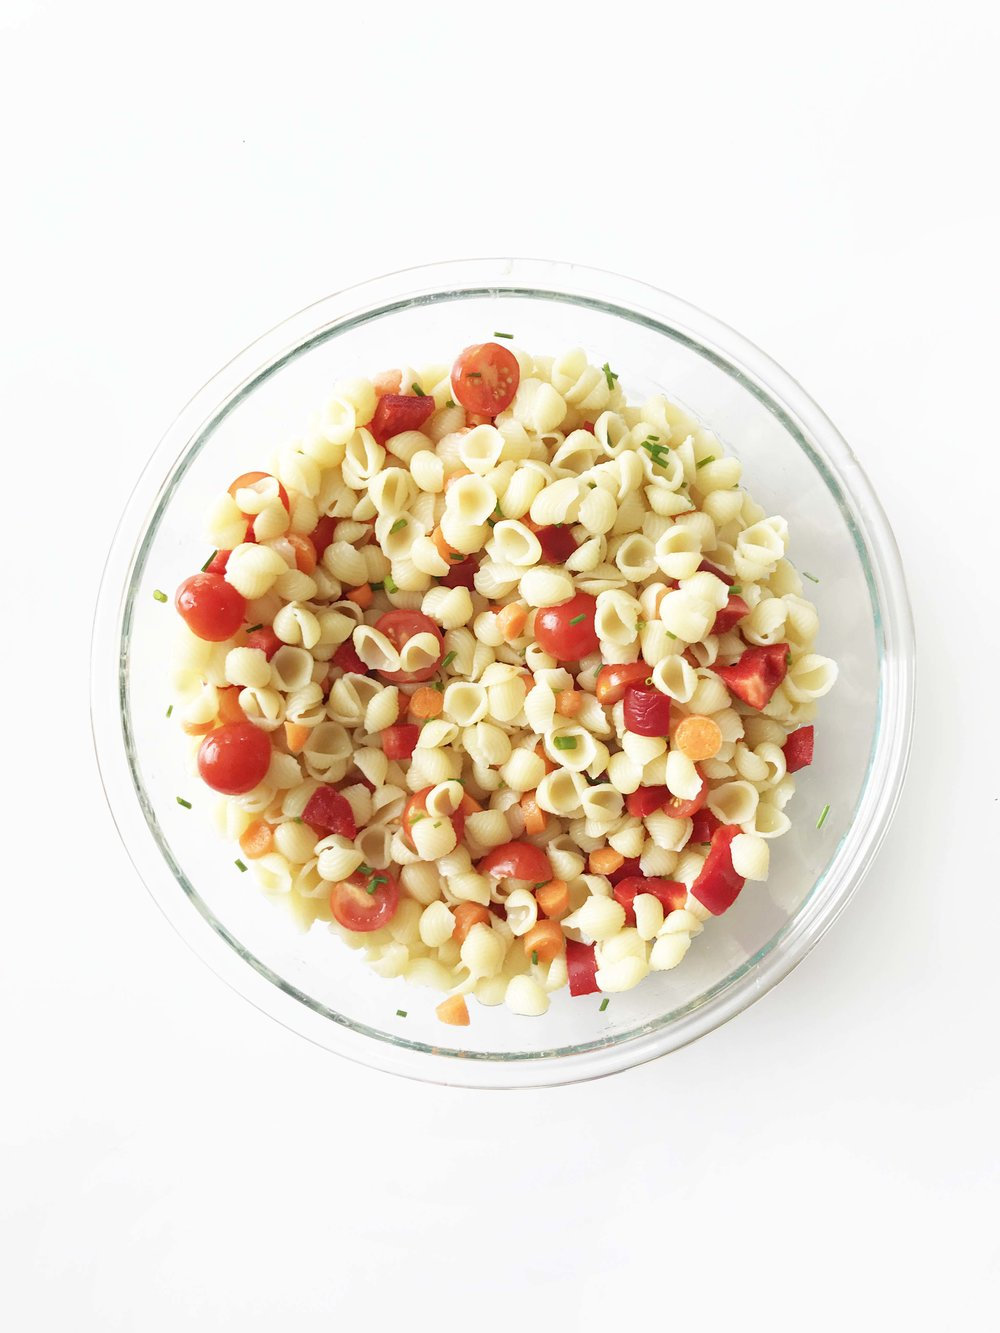 seashell-pasta-salad2.jpg